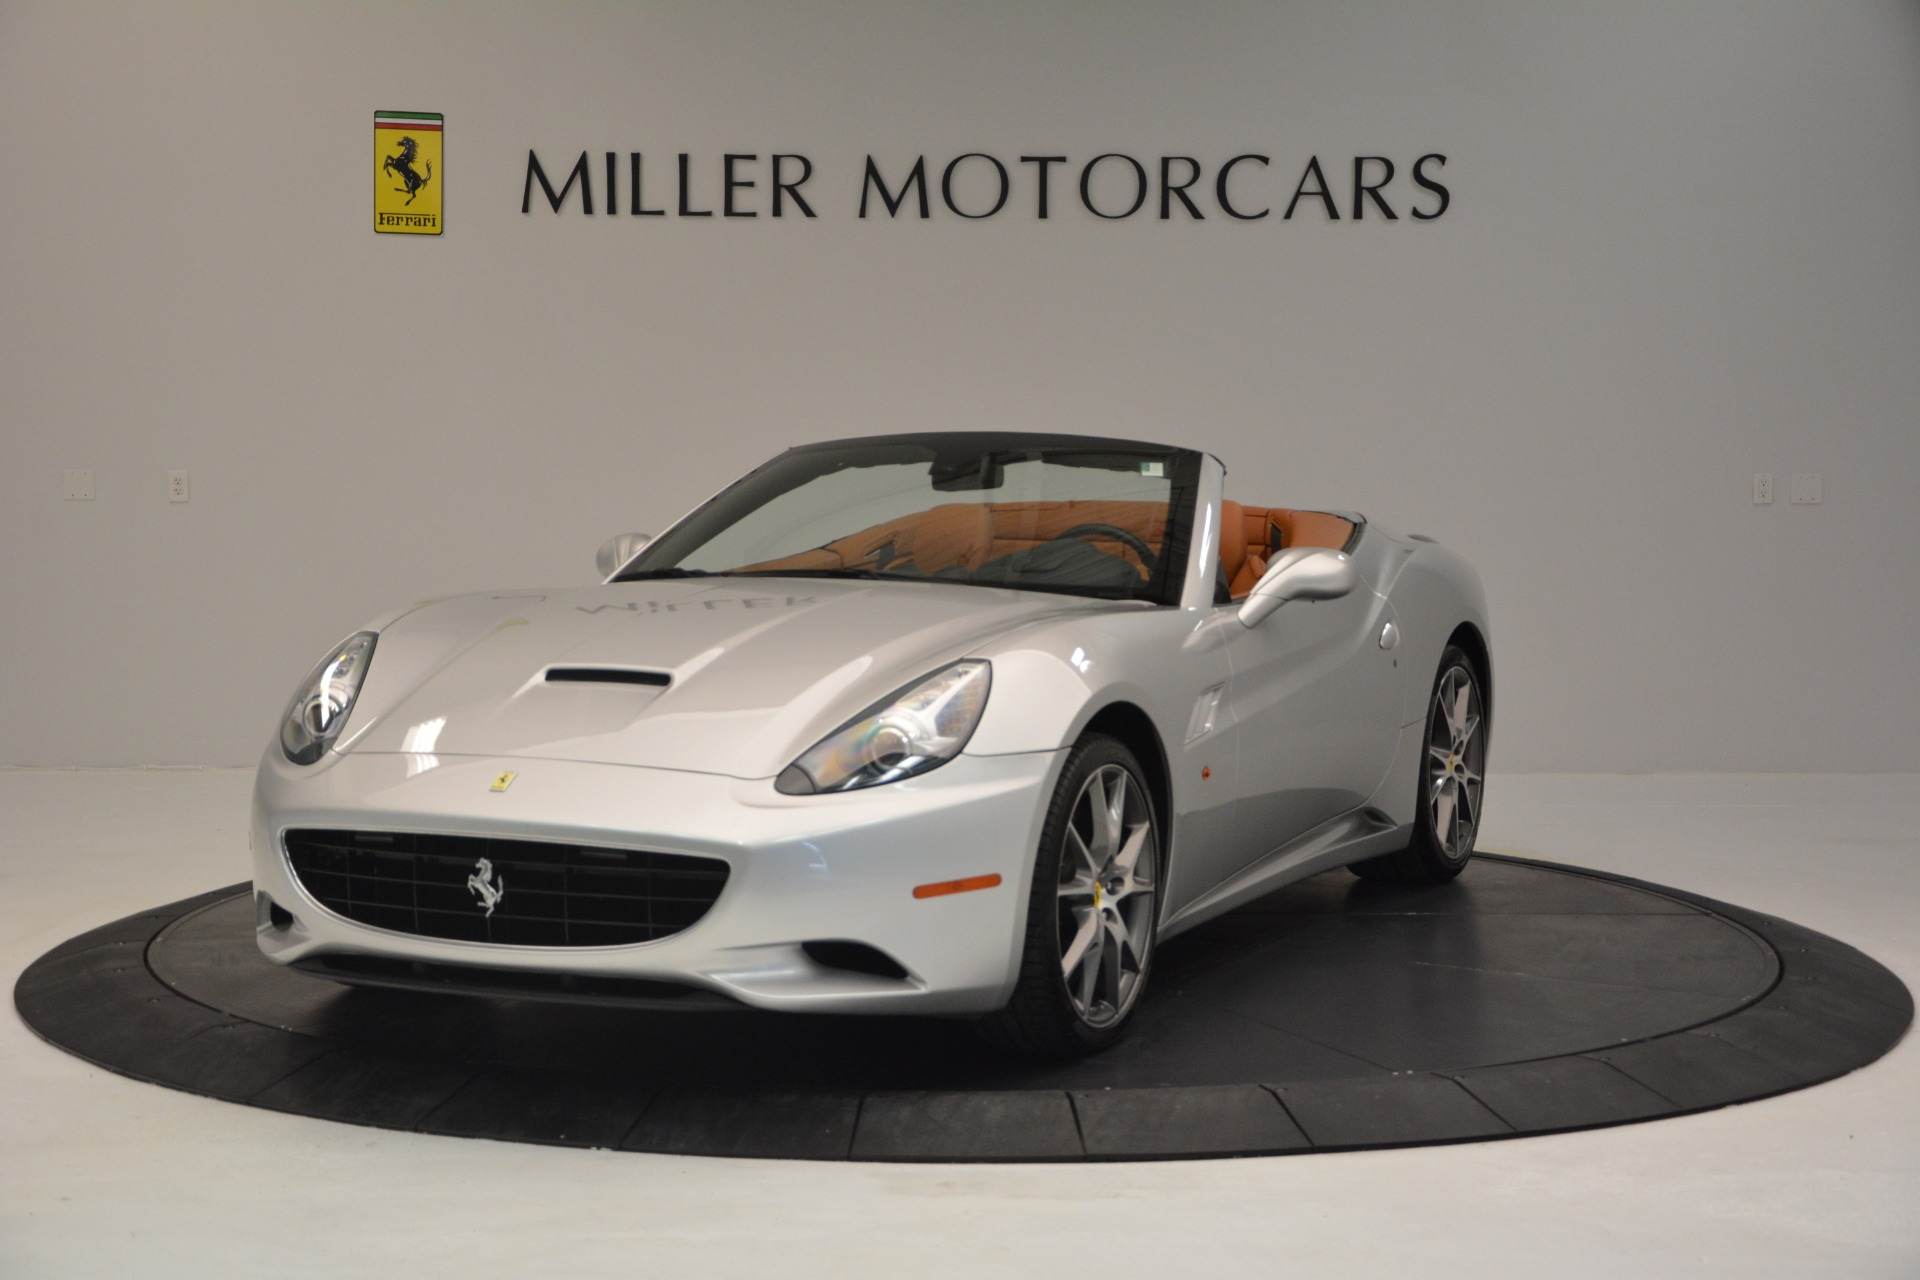 Used 2010 Ferrari California for sale Sold at Aston Martin of Greenwich in Greenwich CT 06830 1